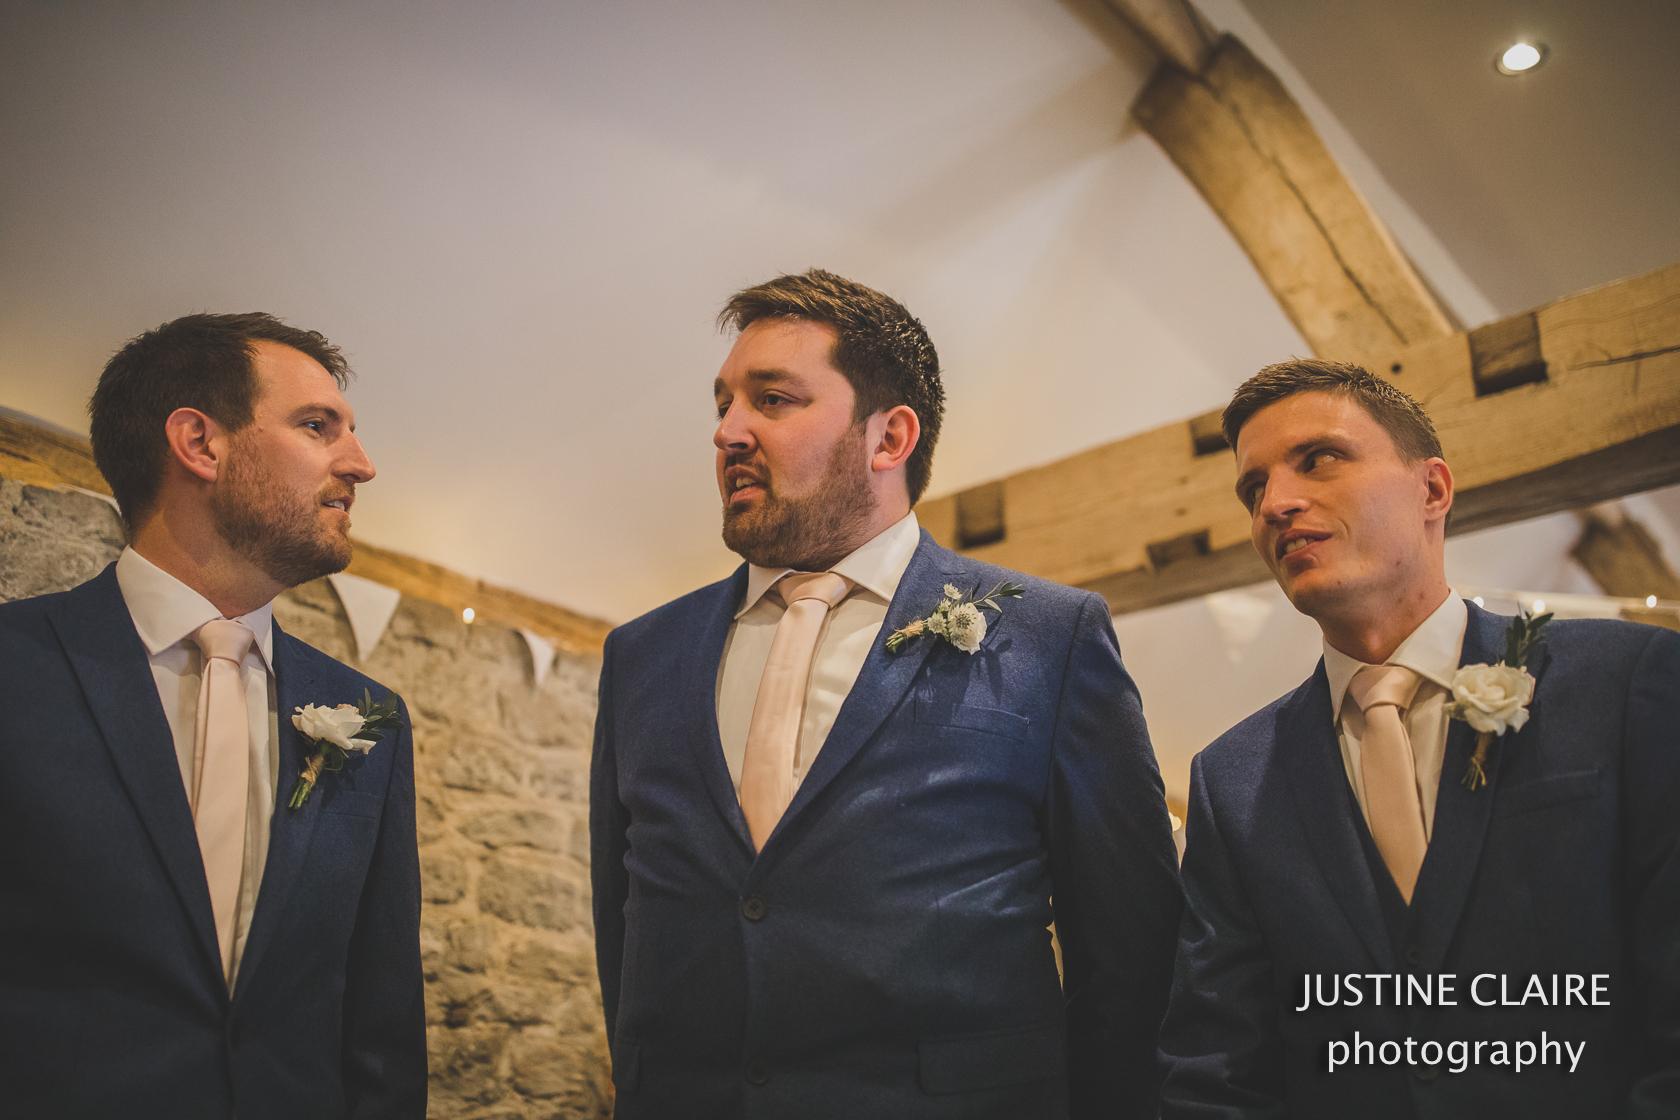 Fitzleroi Fittleworth petworth Billingshurst farm Wedding Photography by Justine Claire photographer Arundel Worthing Brighton-15.jpg